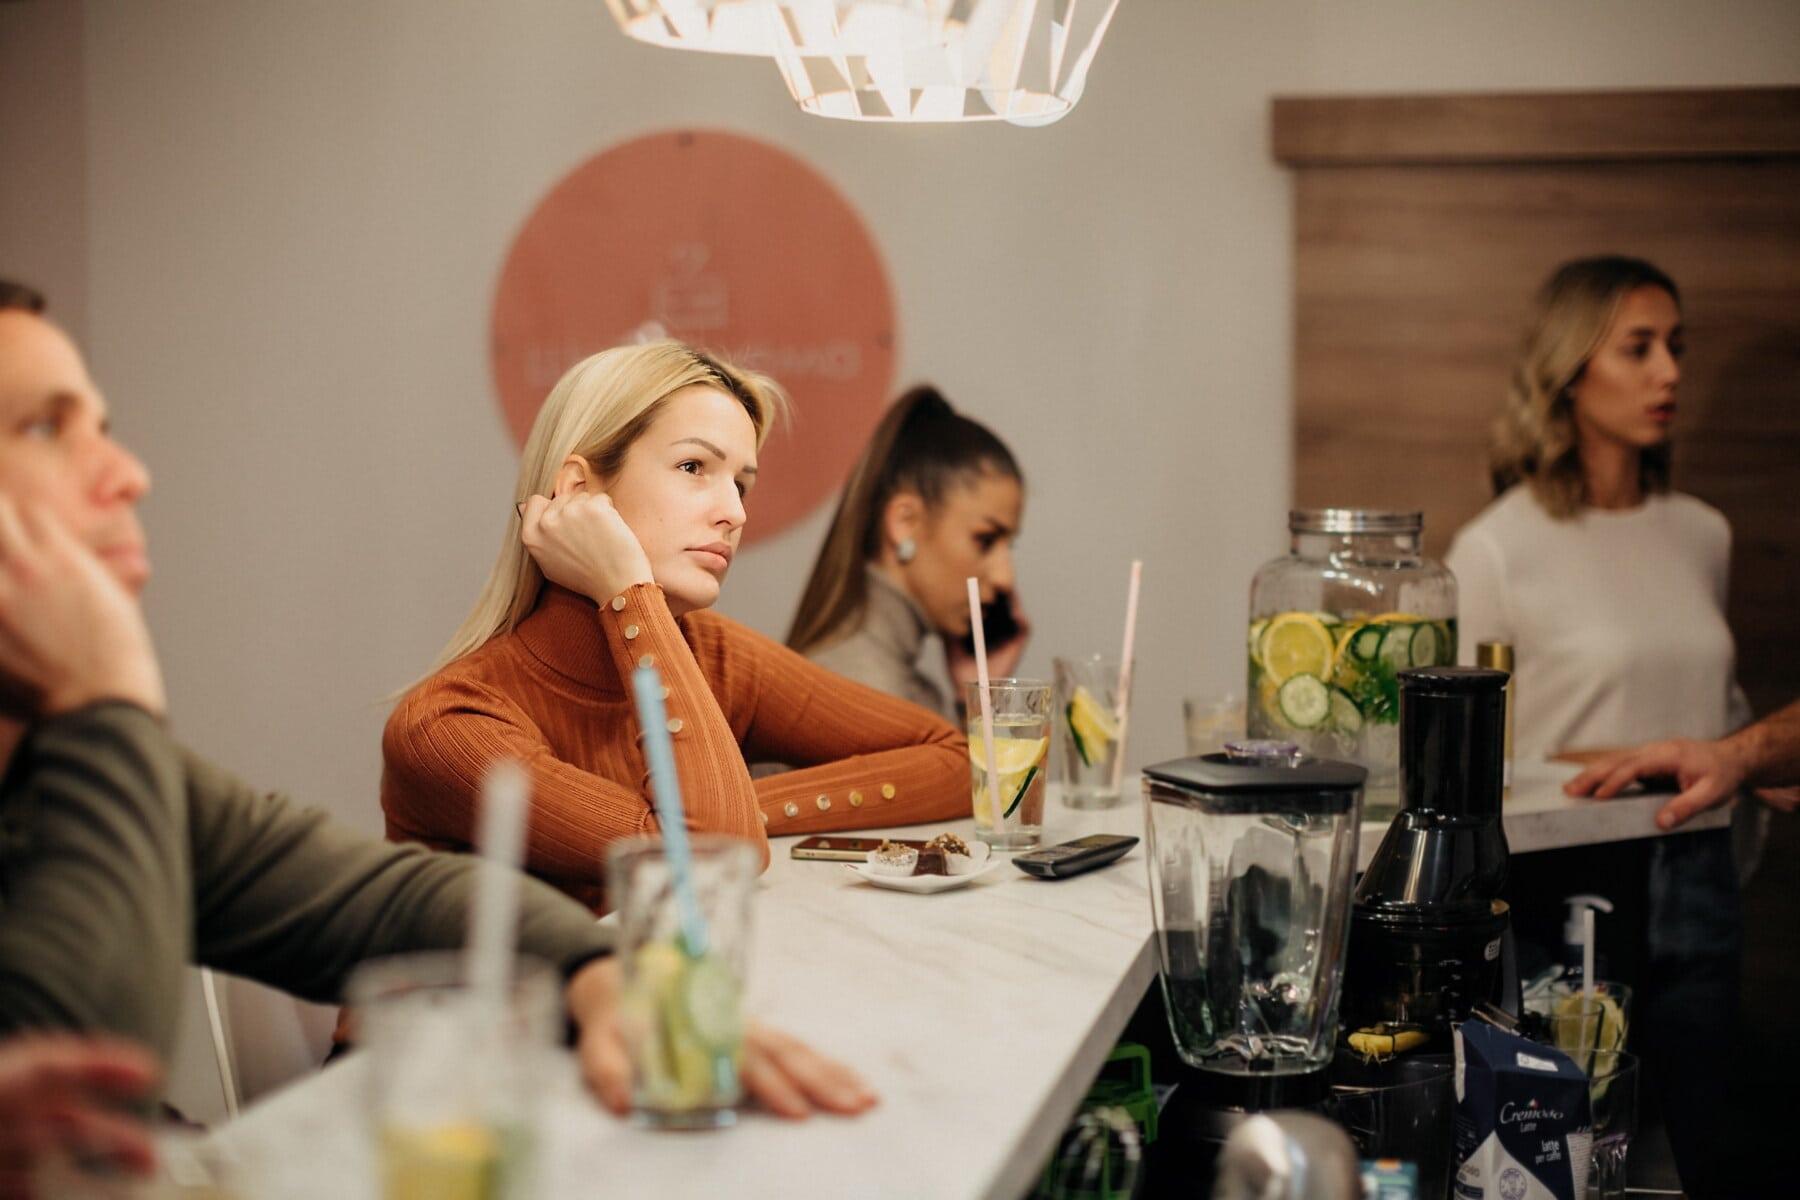 blonde, gorgeous, lemonade, cafeteria, restaurant, indoors, woman, man, togetherness, people